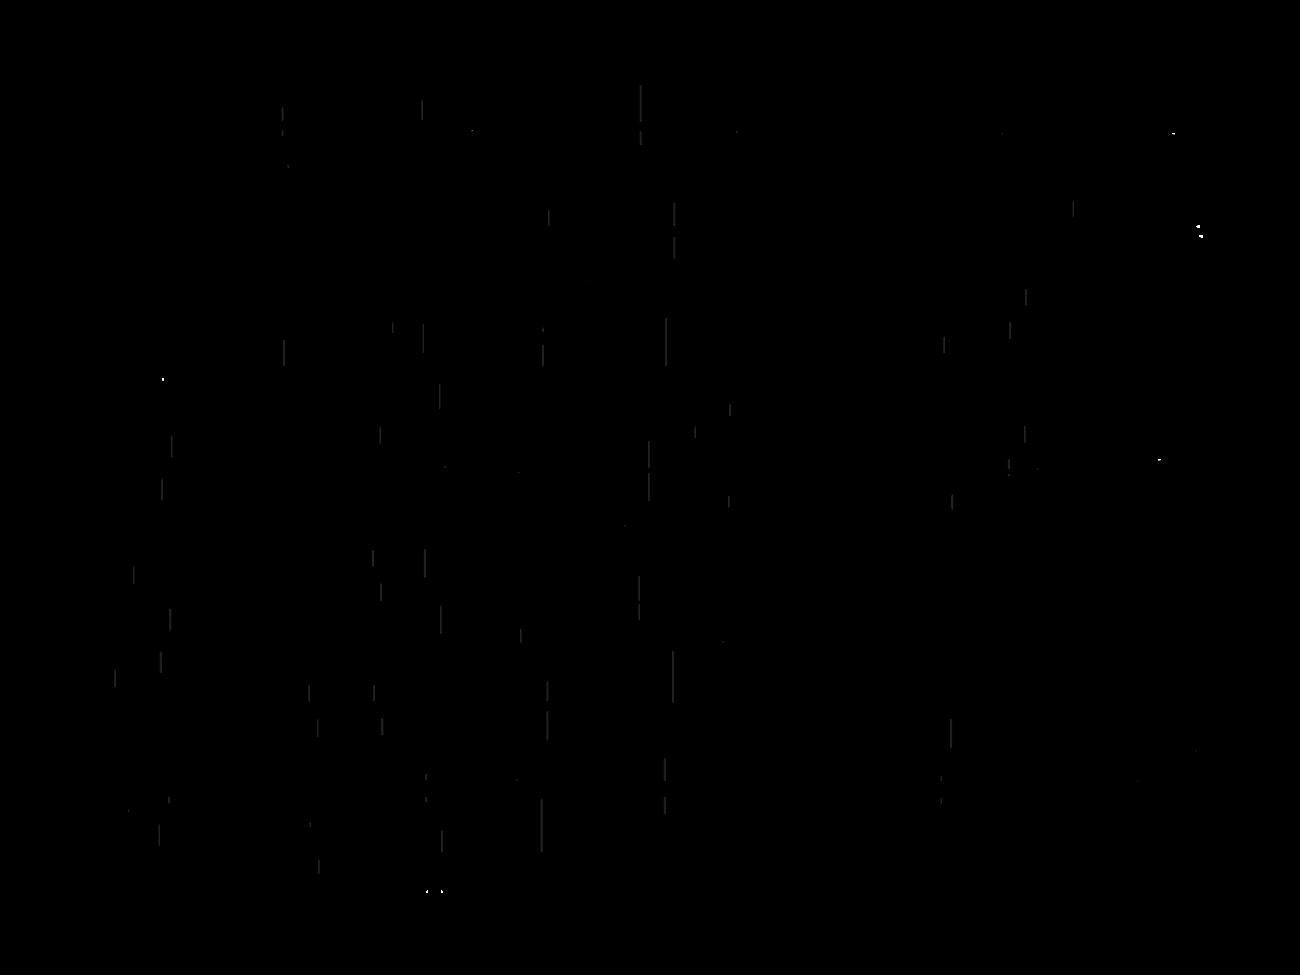 Clipart Straßenraster